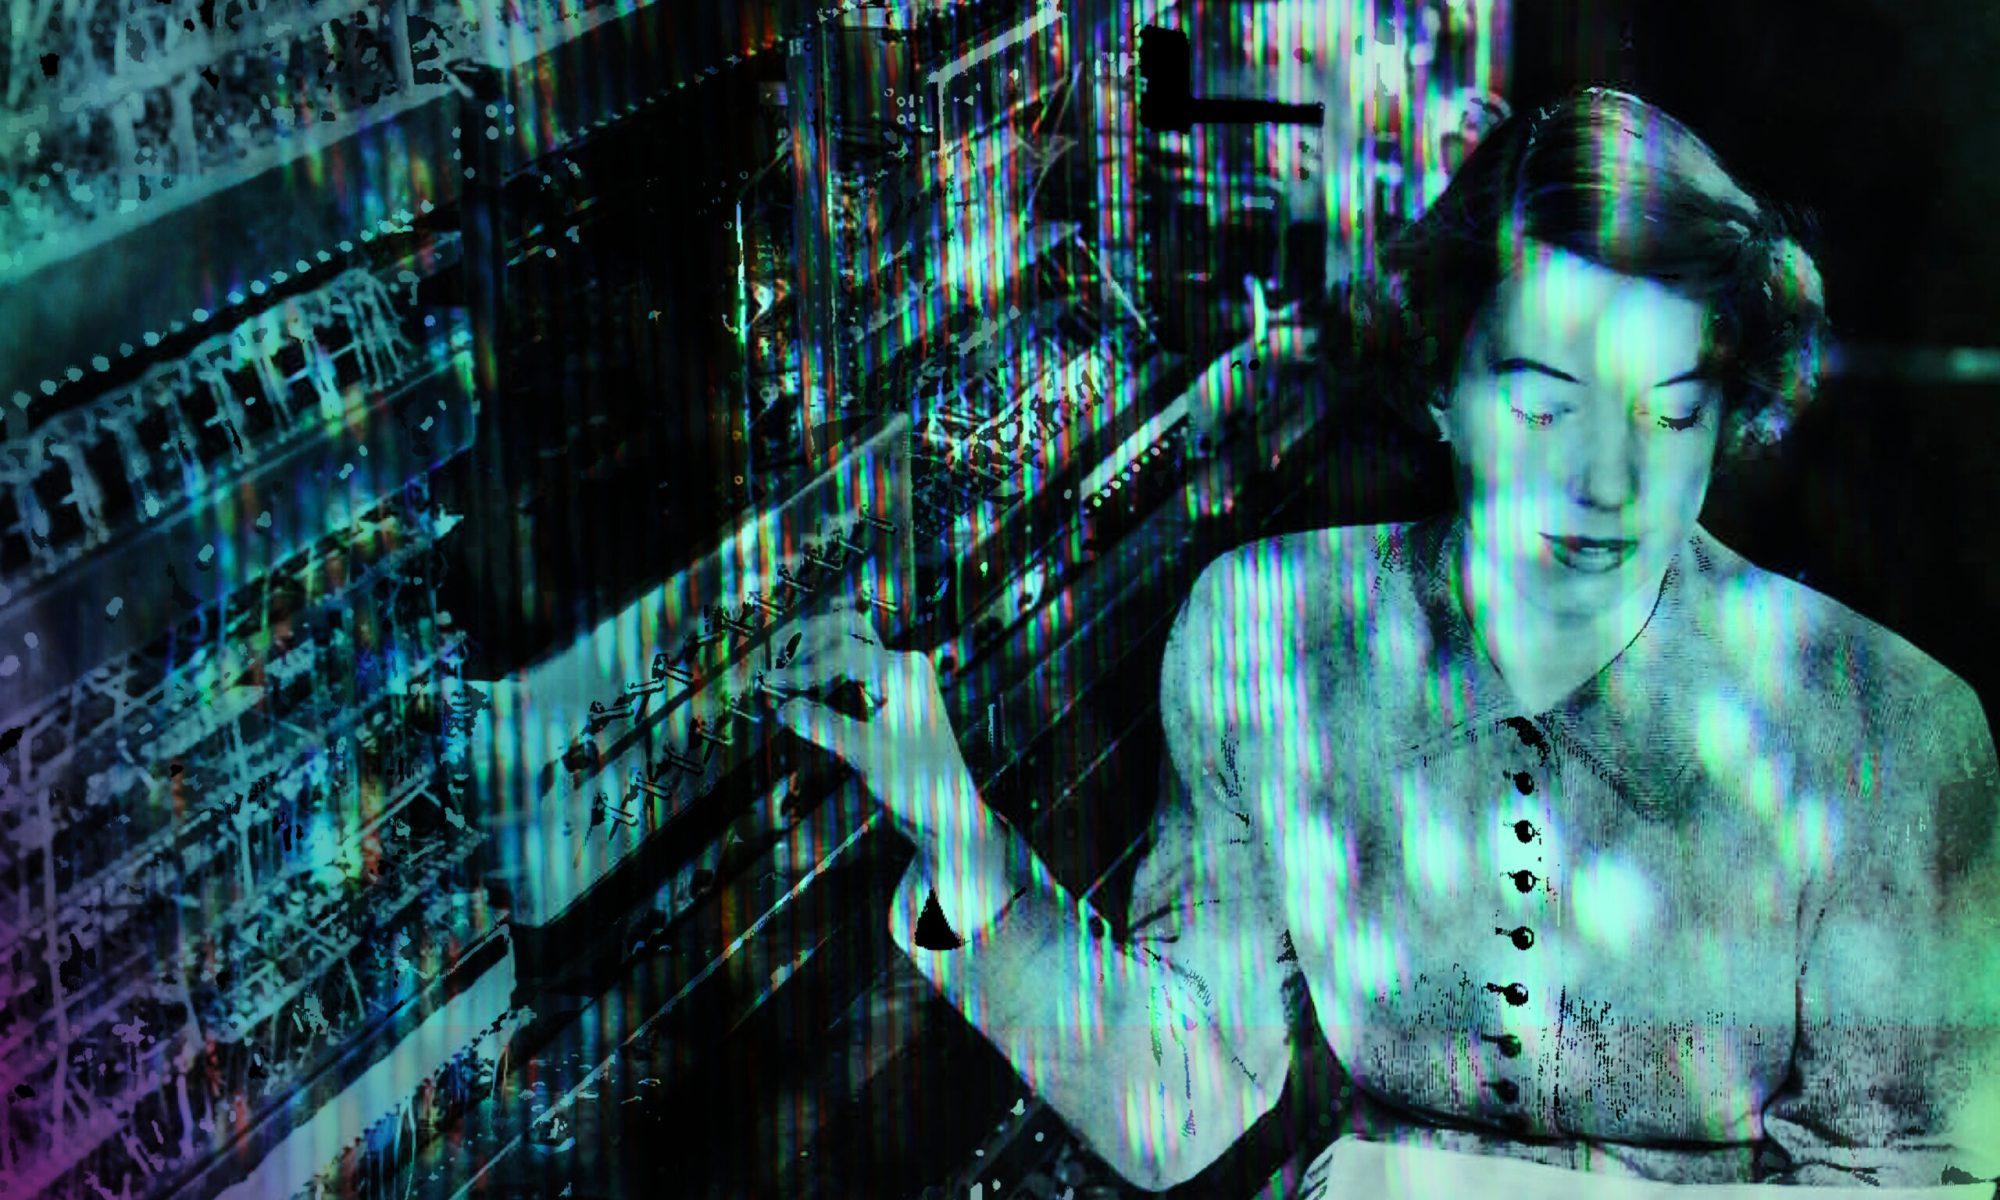 Industrial music artist megabyteGhost's industrial music album Dead_Mans_Switch cover art.